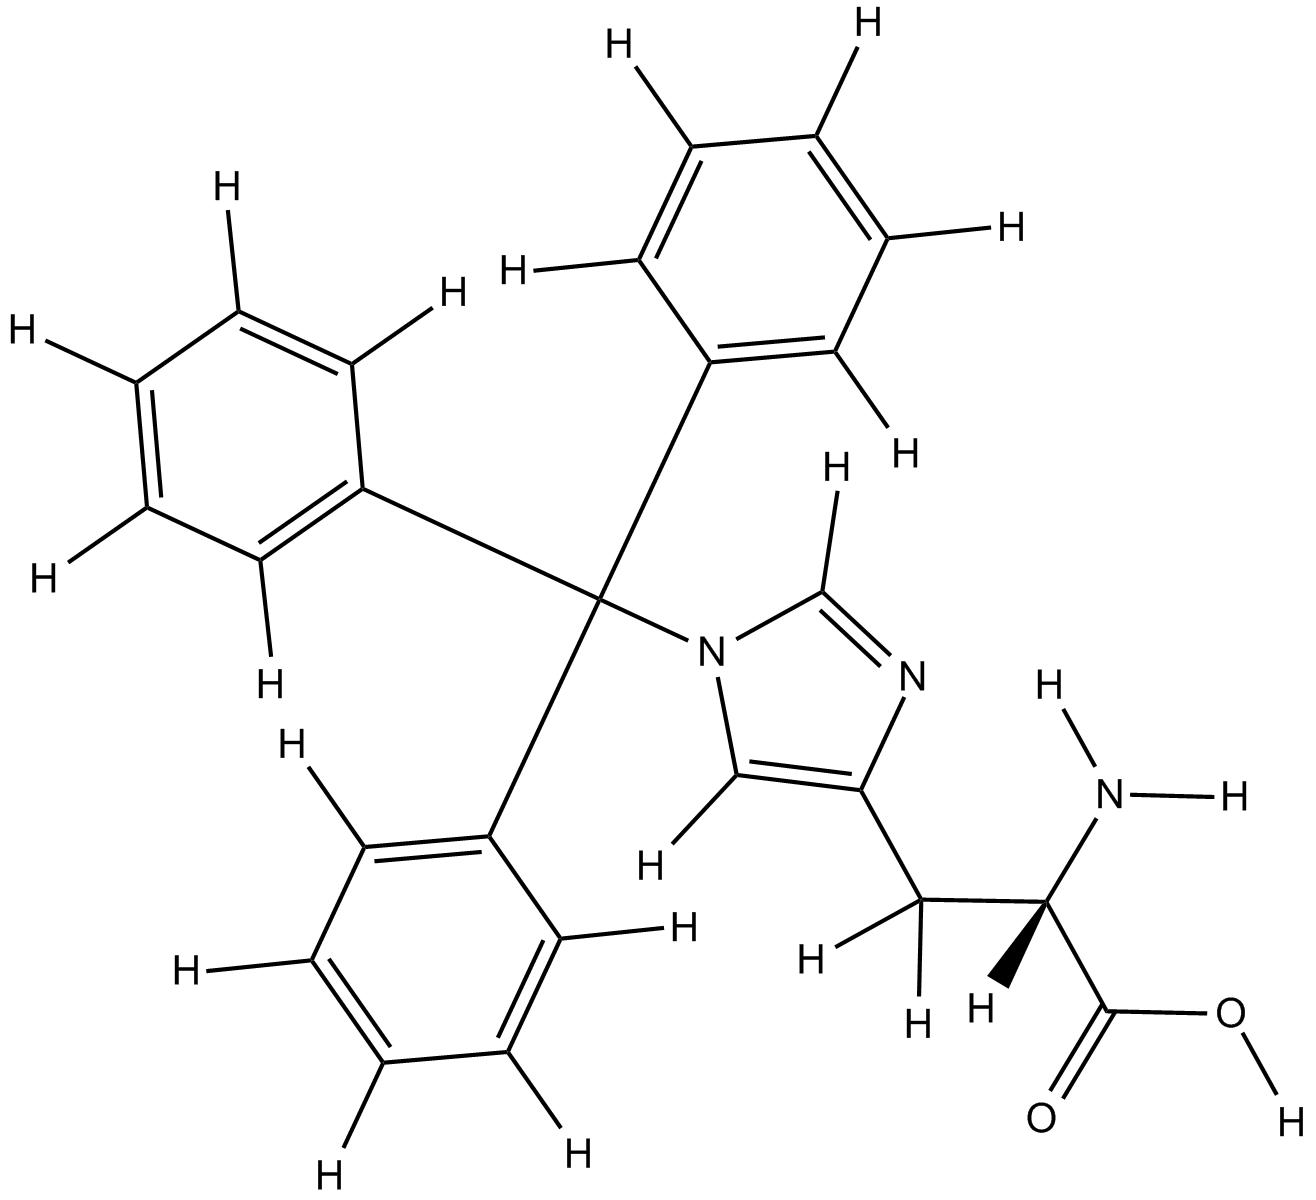 H-His(Trt)-2-Chlorotrityl Resin